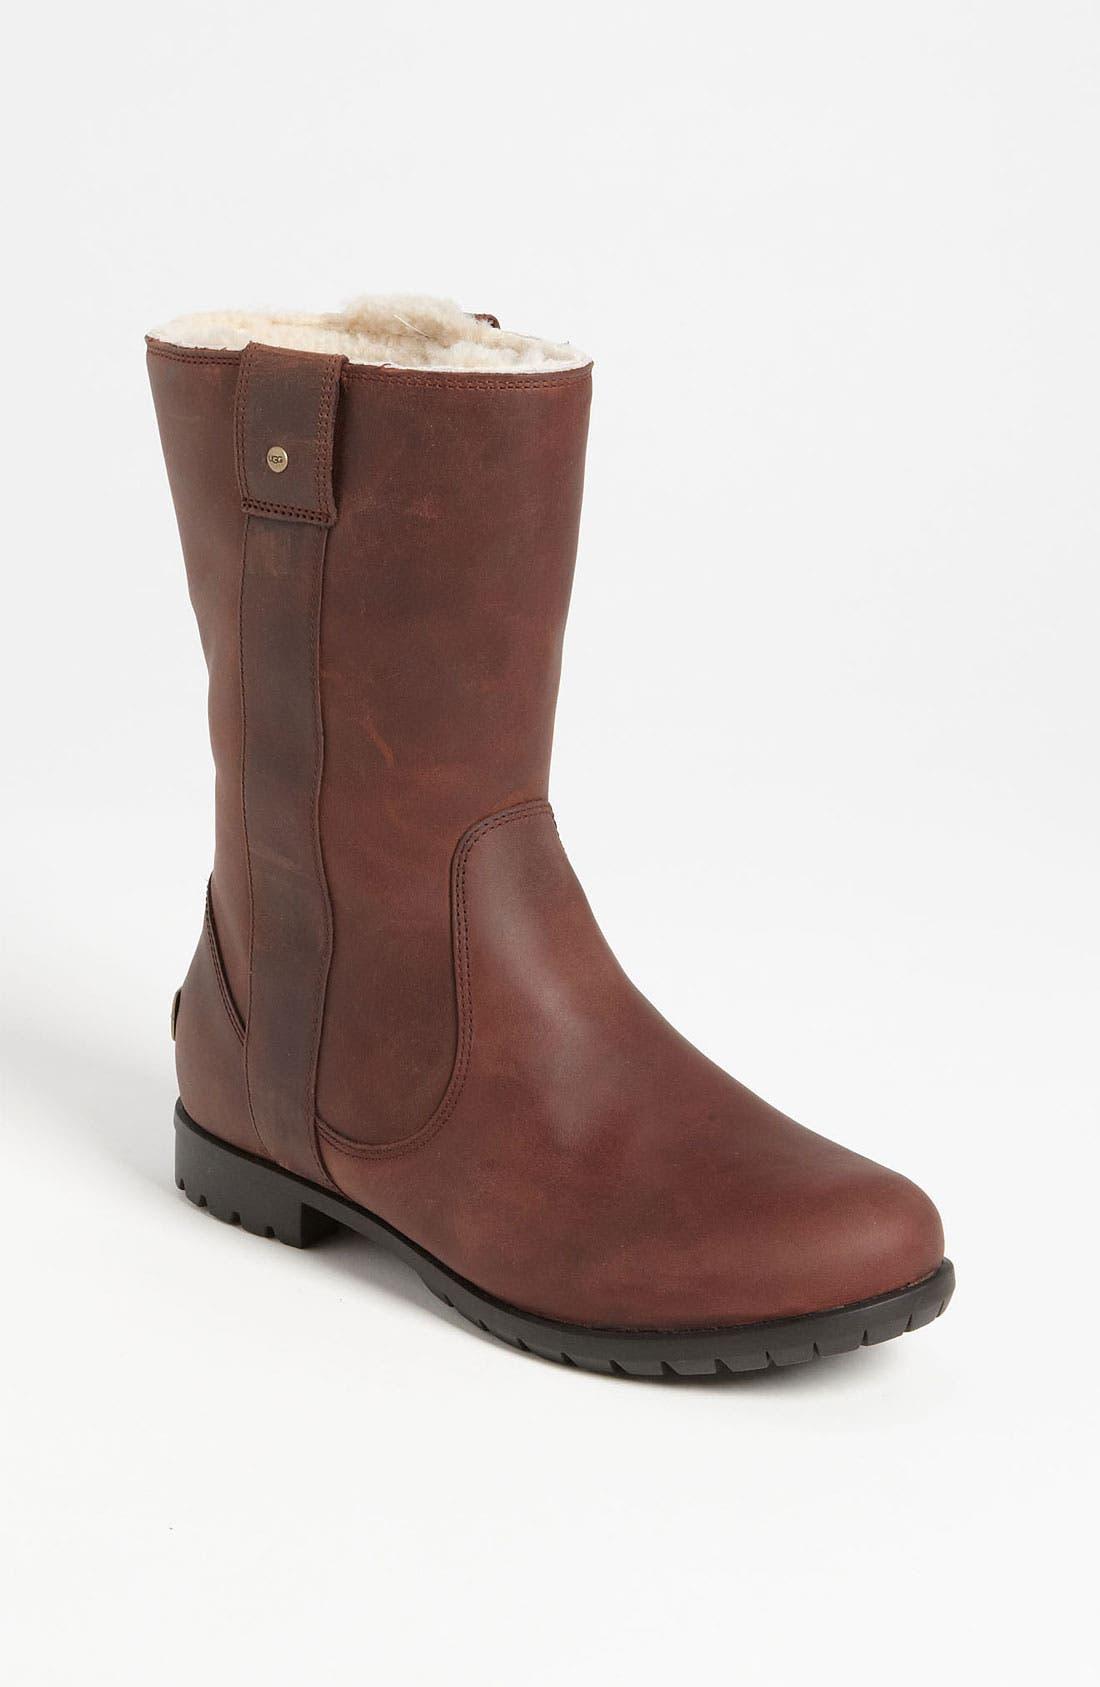 Alternate Image 1 Selected - UGG® Australia 'Burroughs' Boot (Women)